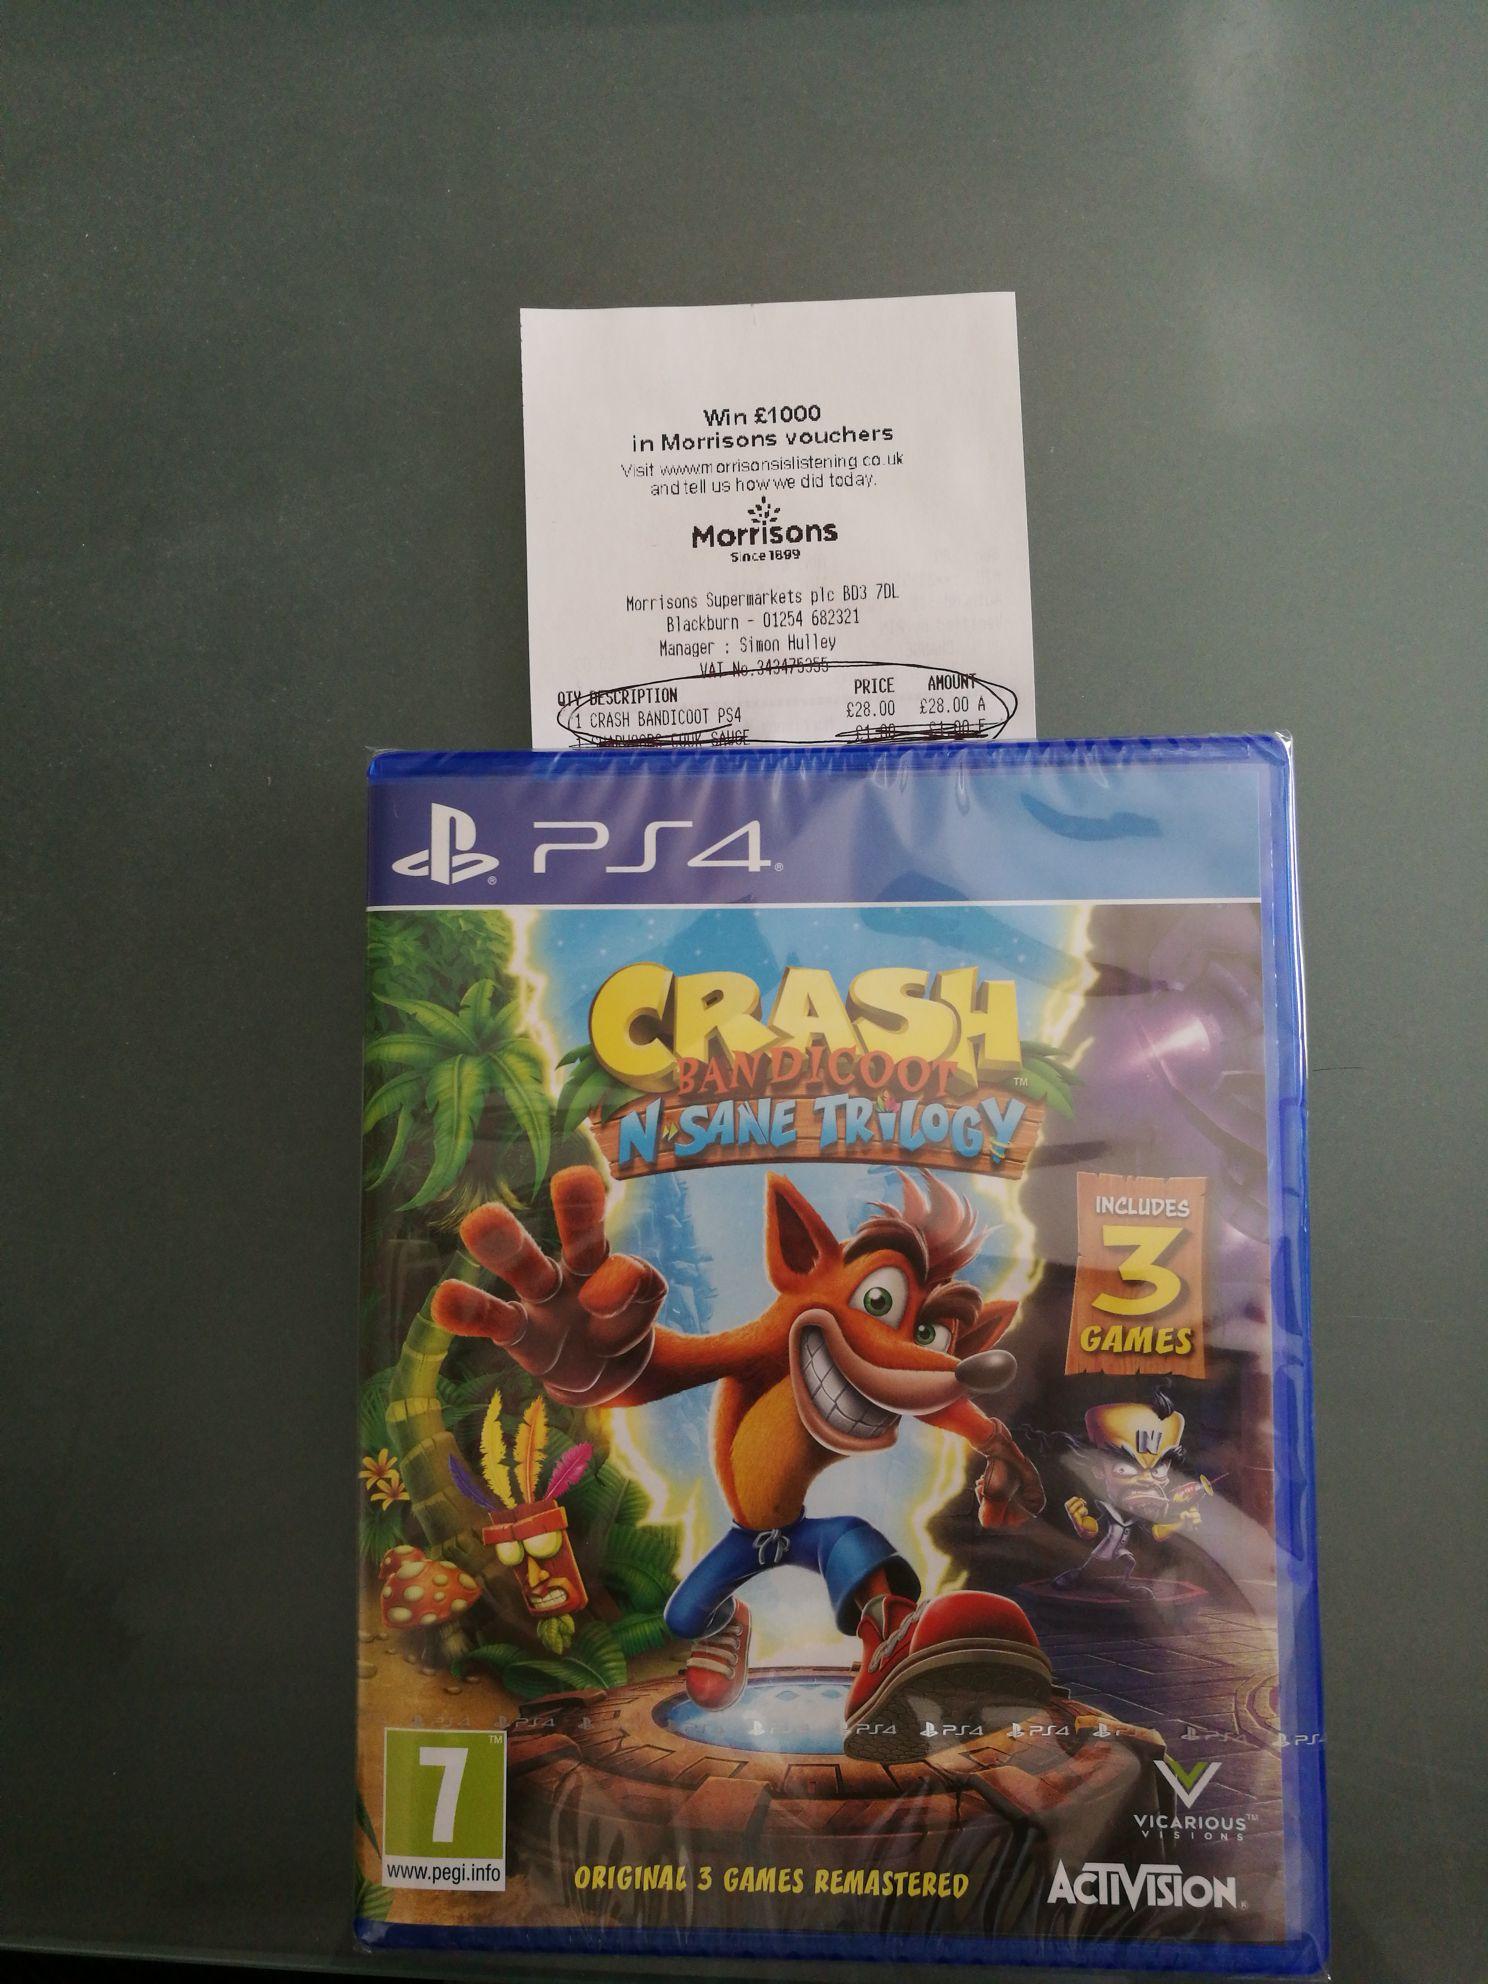 Crash Bandicoot Nsane Trilogy £28 in Morrisons